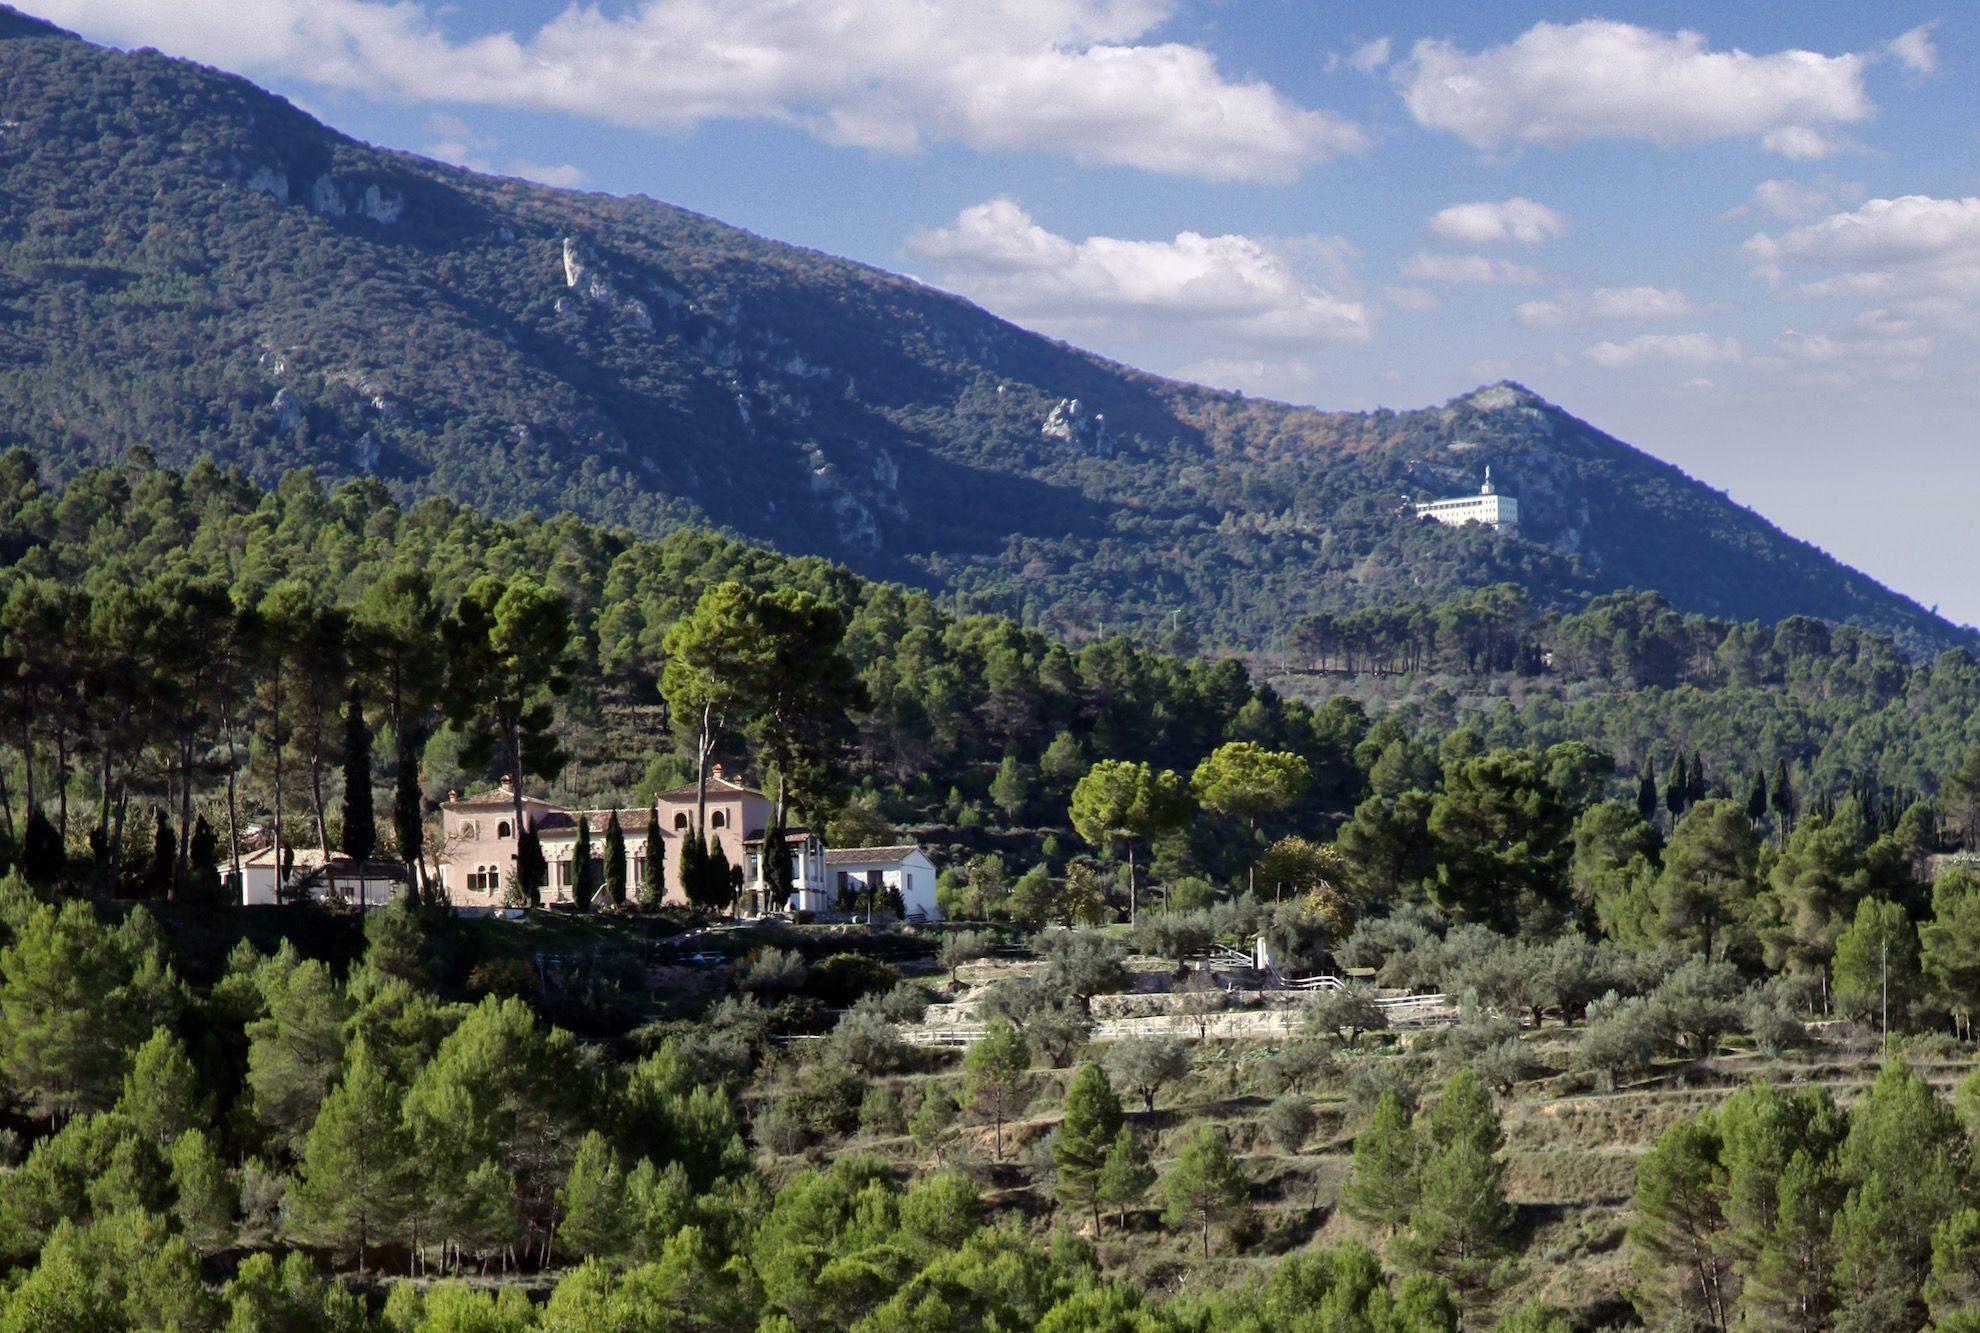 parquenaturalcarrascal e1588083138823 - Carrascal de la Fuente Roja-Valencian Community-Spain